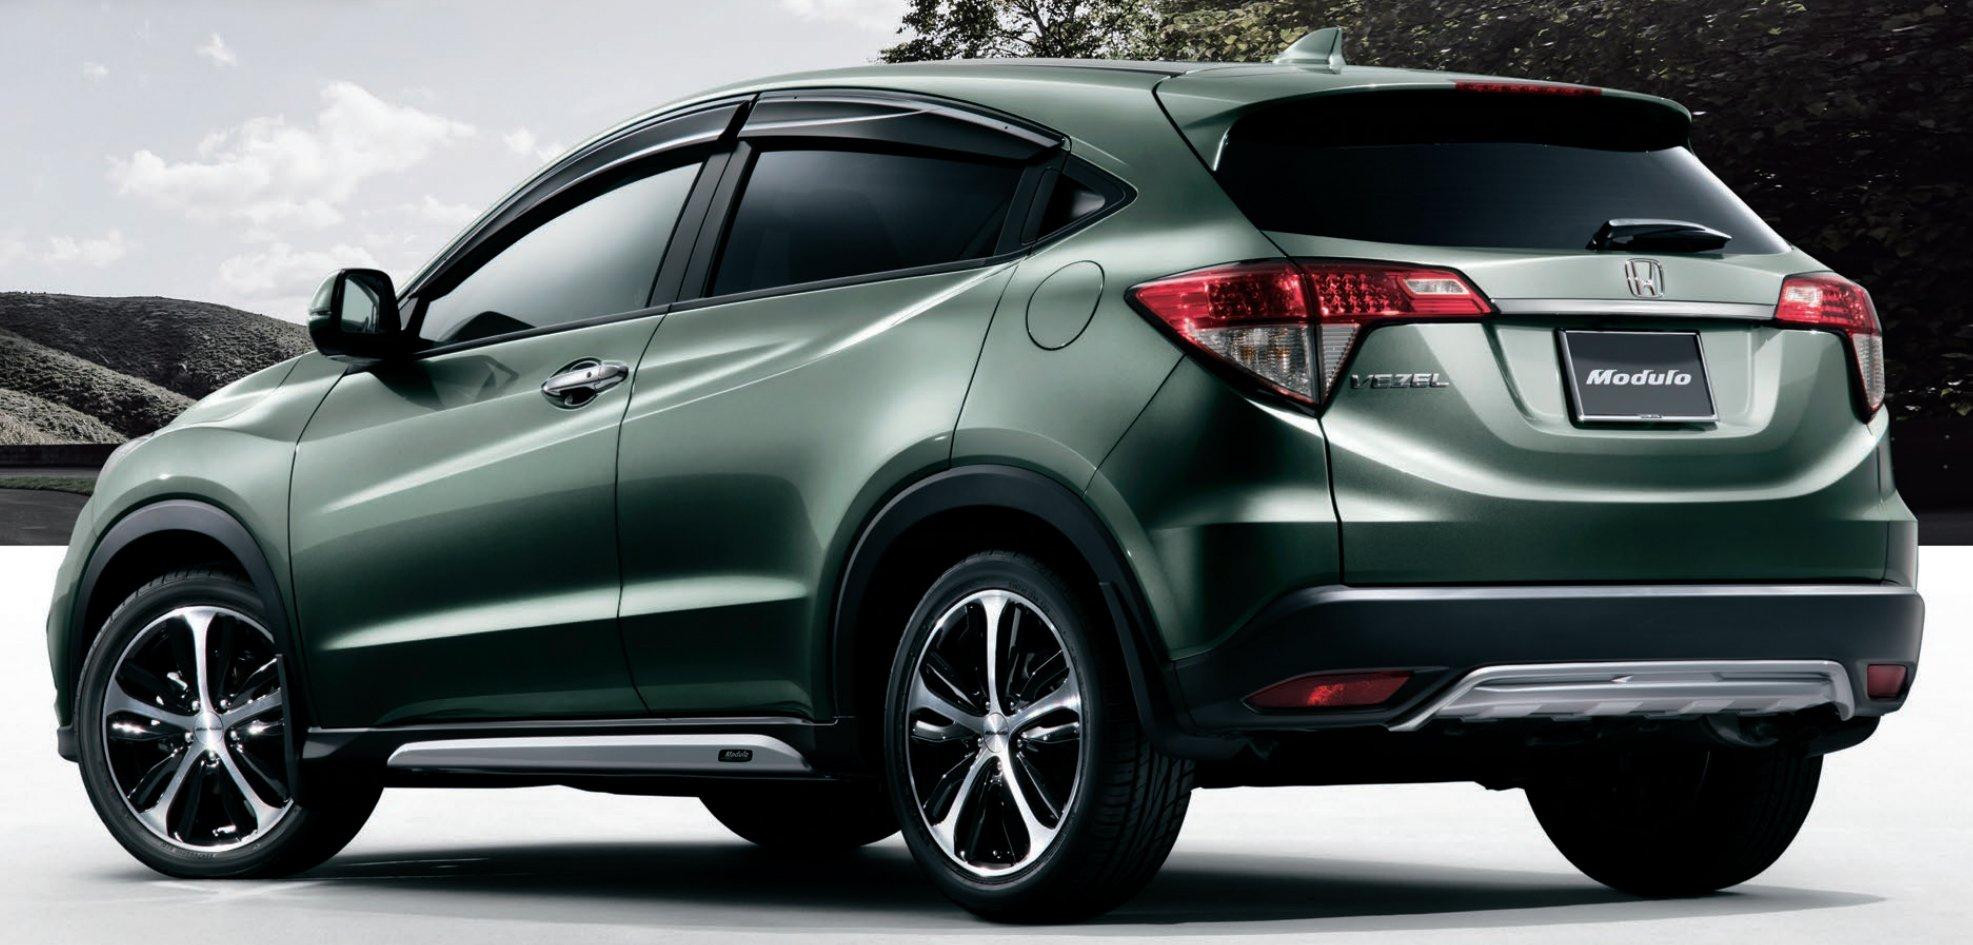 Honda Hr V Modulo >> 2018 Honda HR-V facelift gets Mugen and Modulo kits Paul Tan - Image 780183